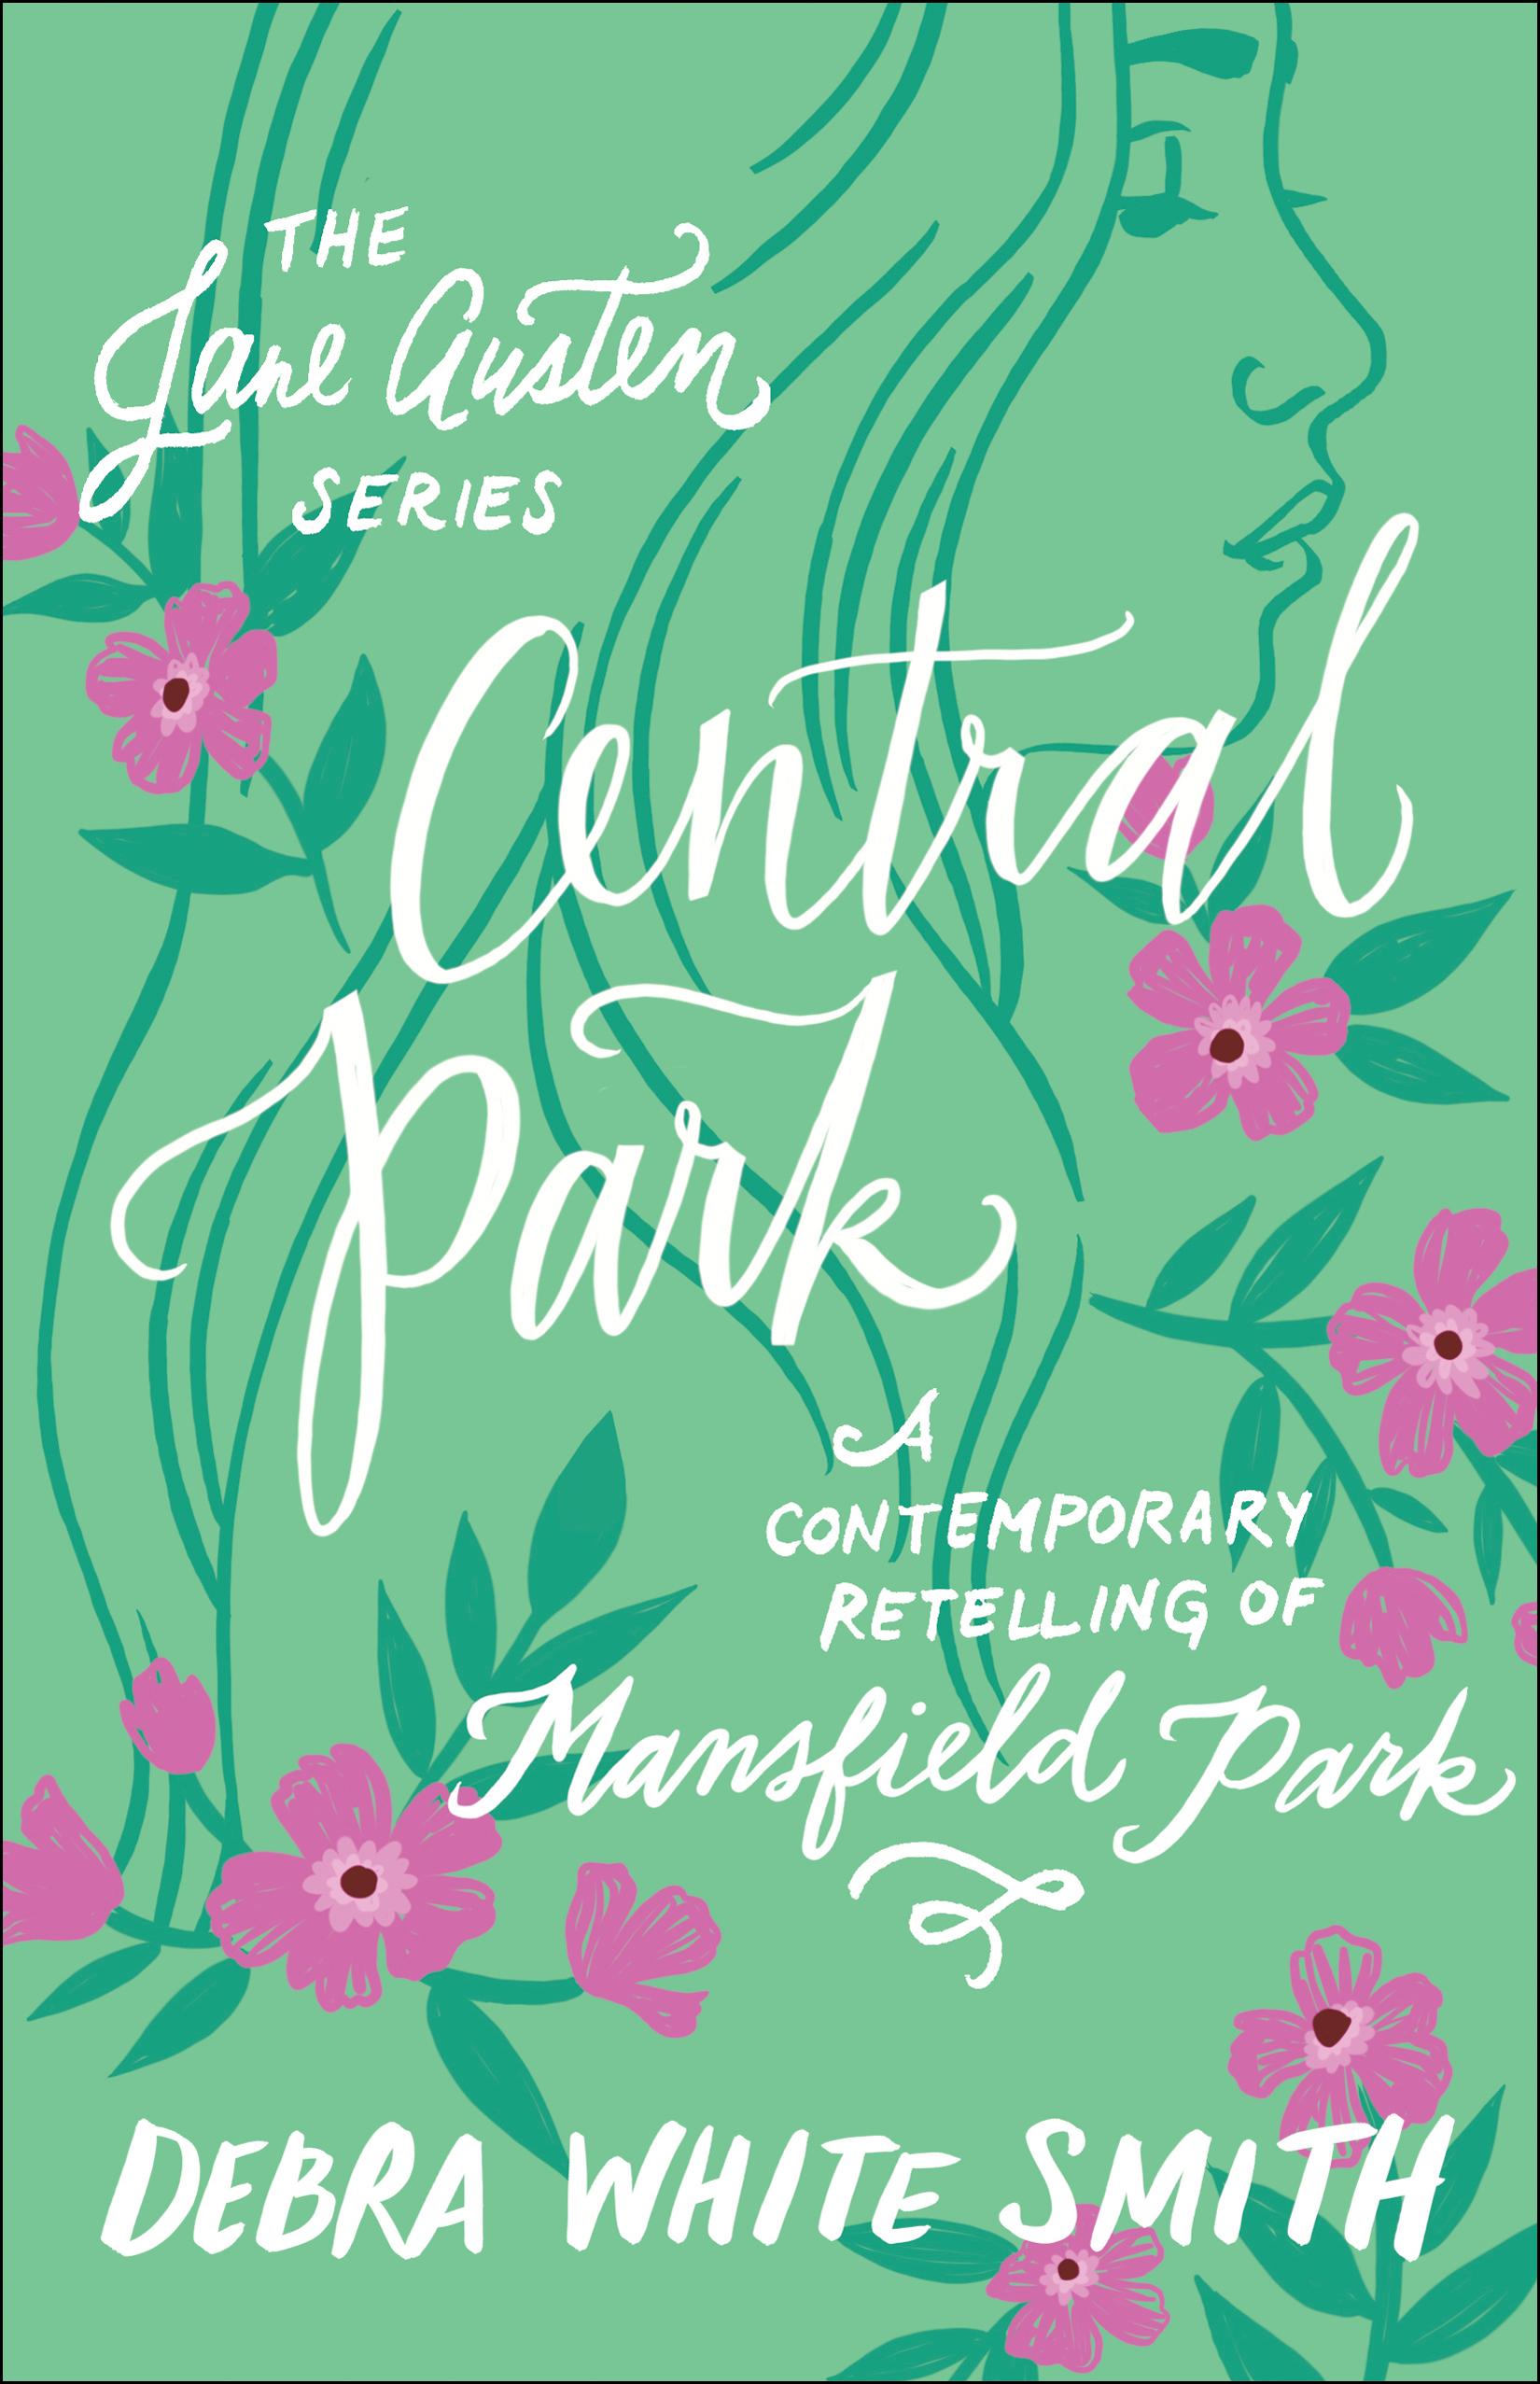 Central Park (The Jane Austen Series) A Contemporary Retelling of Mansfield Park